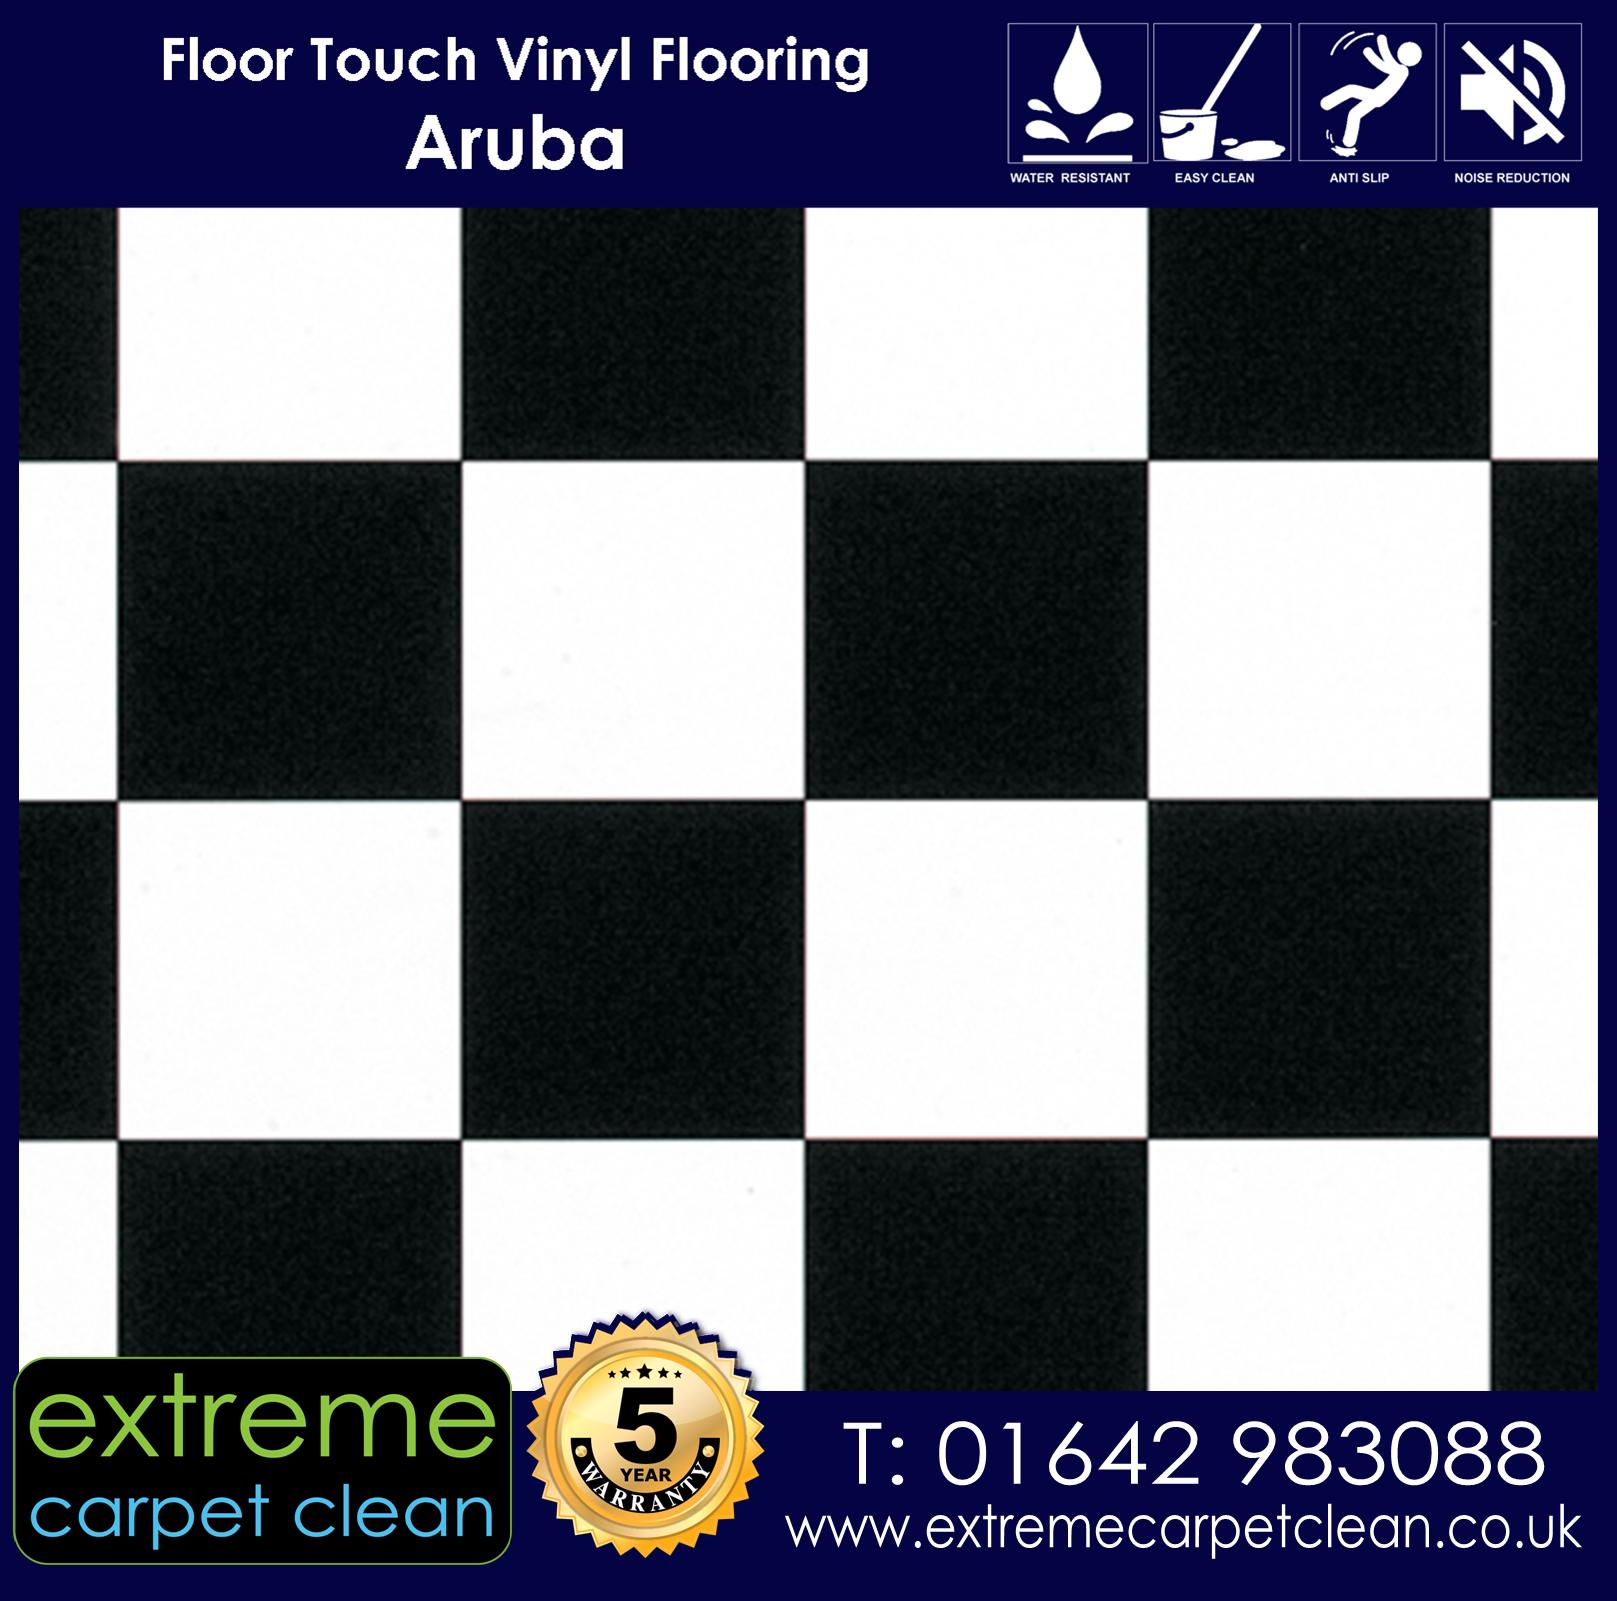 Extreme Carpet Clean. Vinyl Flooring. Aruba